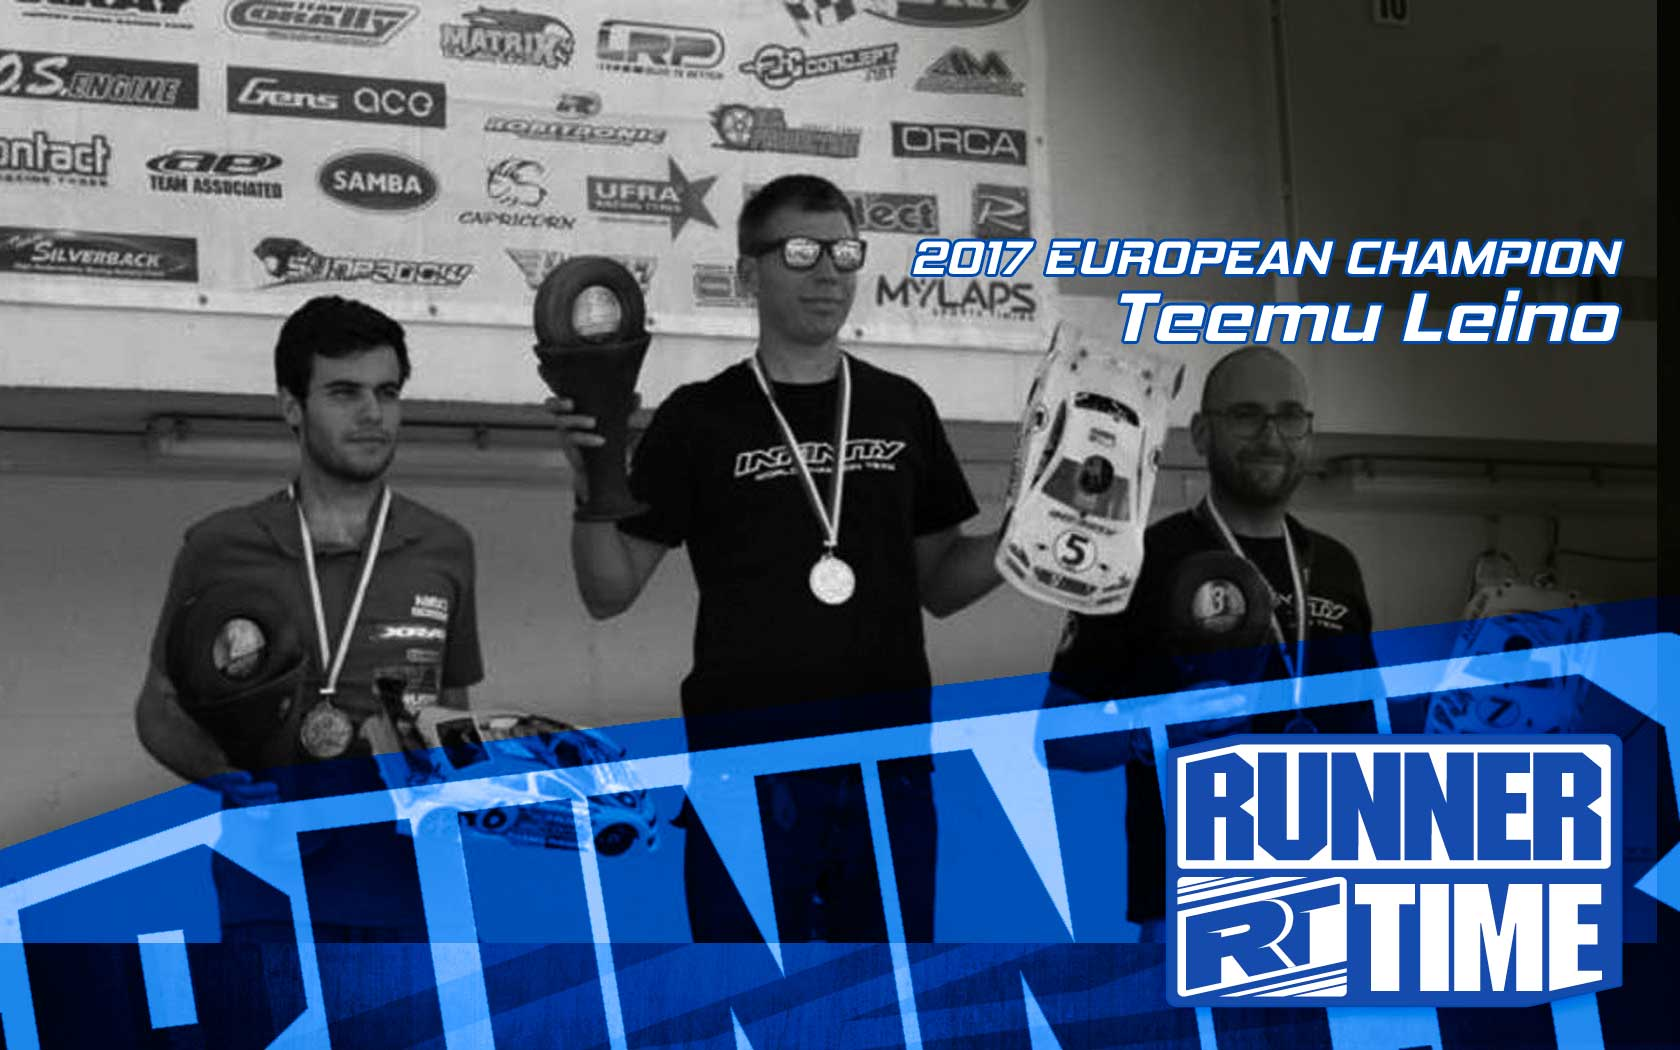 Teemu_Leino_European_Champion_2018